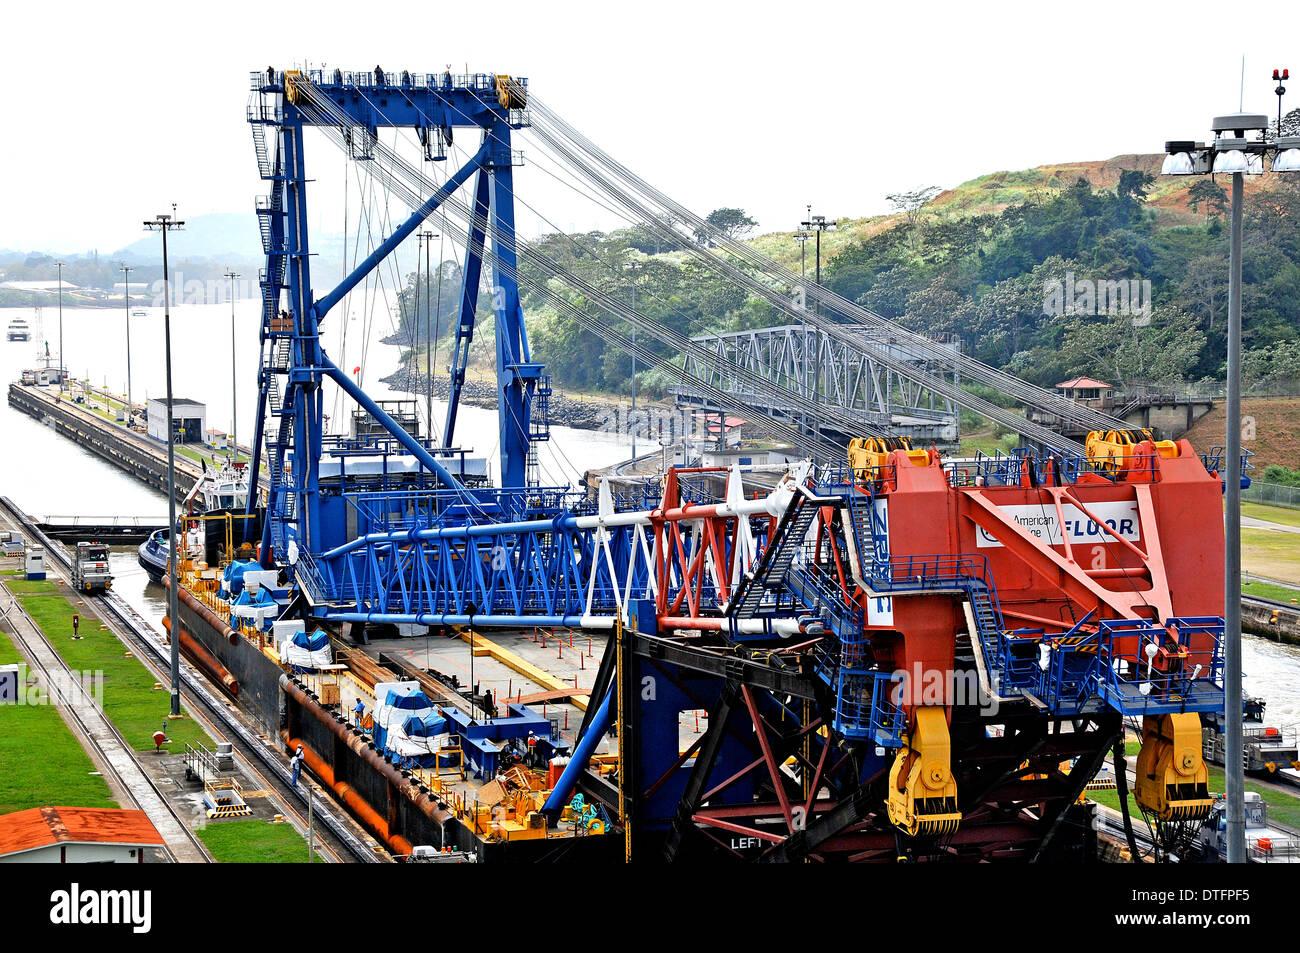 Left Coast Lifter, the giant floating crane of 'American Bridge Fluor' in Panama canal Miraflores locks Panama - Stock Image